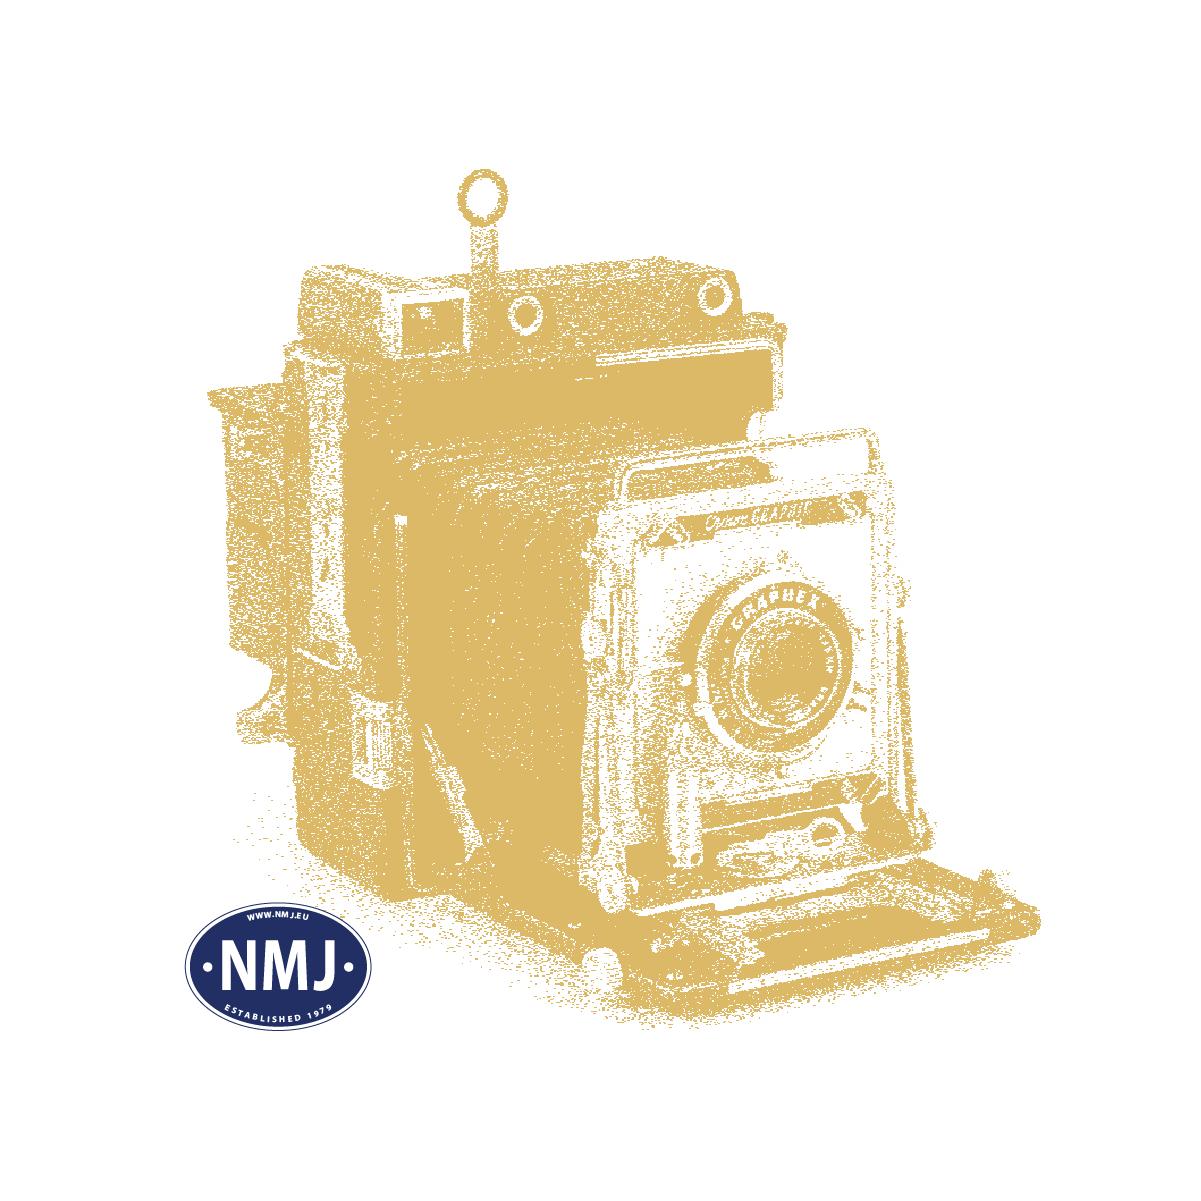 NMJT84.101 - NMJ Topline NSB BM69A.01, DC, rotbraun